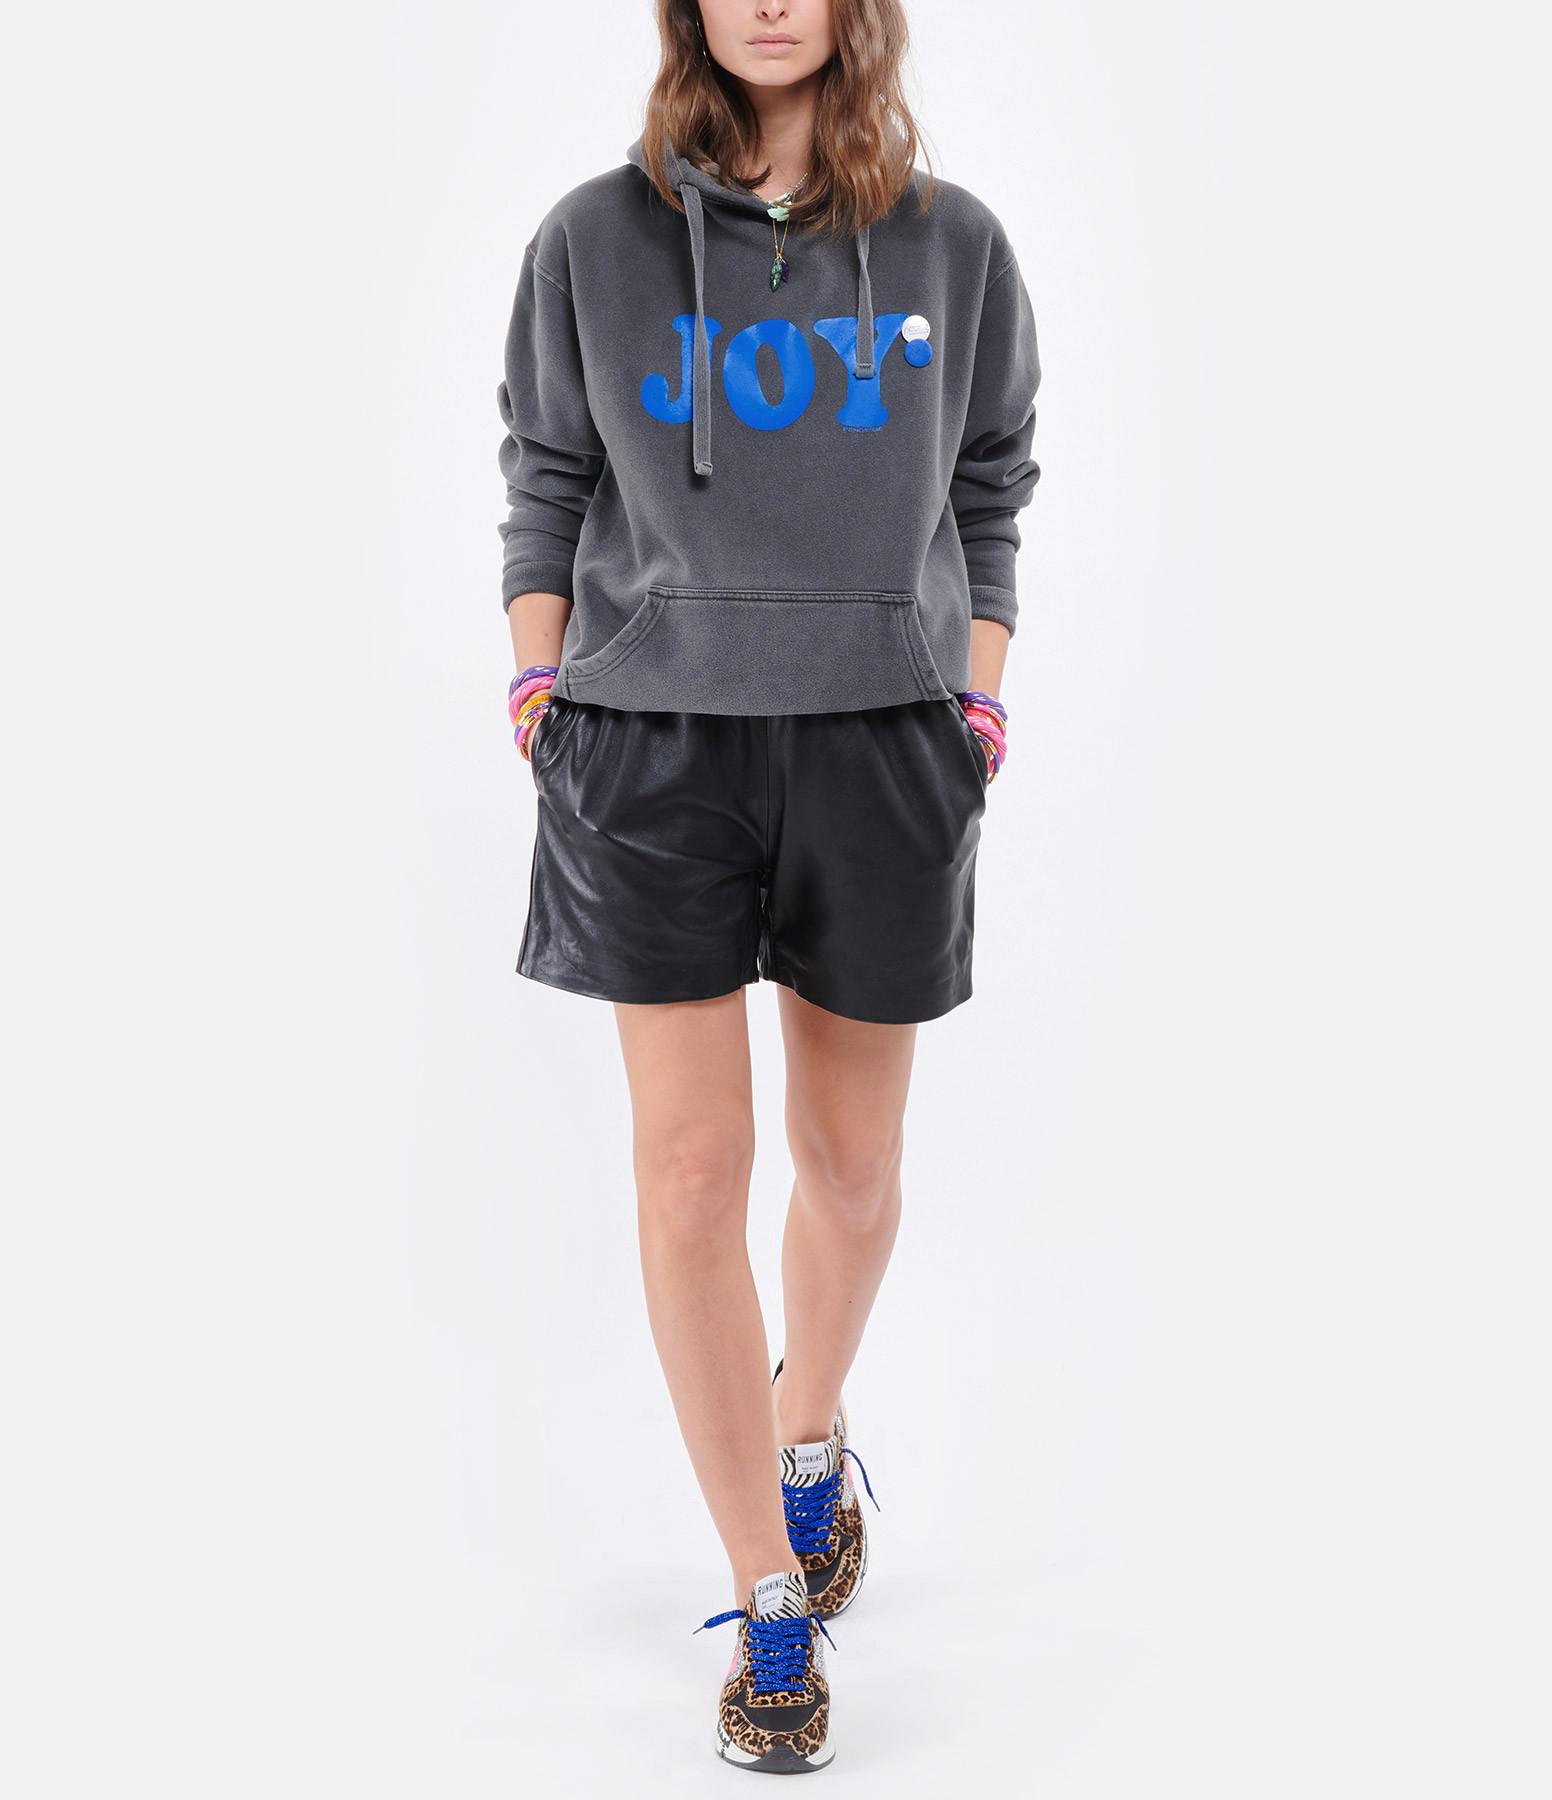 NEWTONE - Sweatshirt Hoodie Joy Coton Pepper